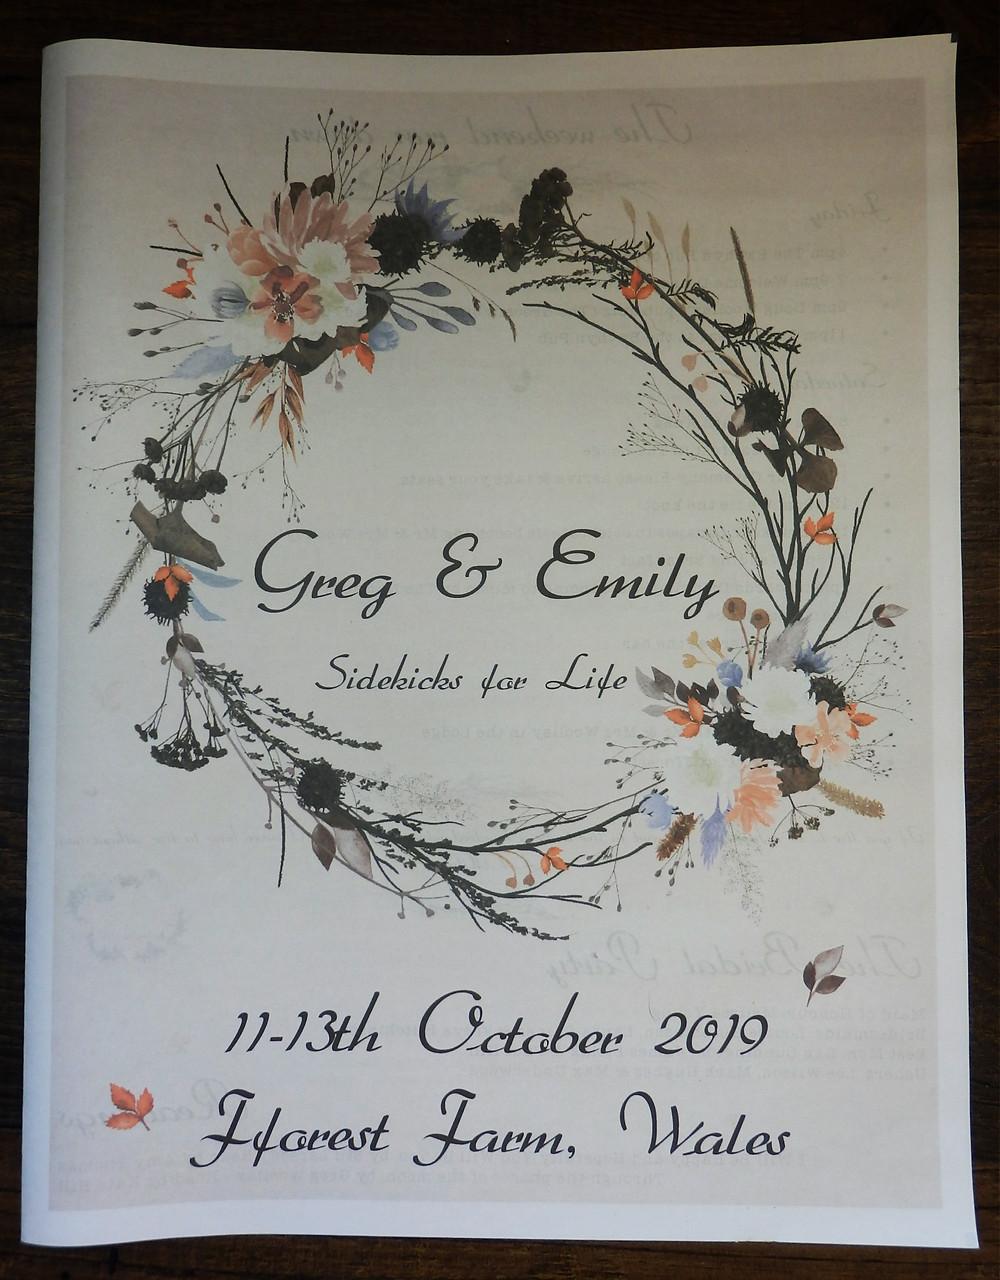 Fforest Farm Wales Autumn Tipi Festival weekend Wedding Program Programme stationery newspaper